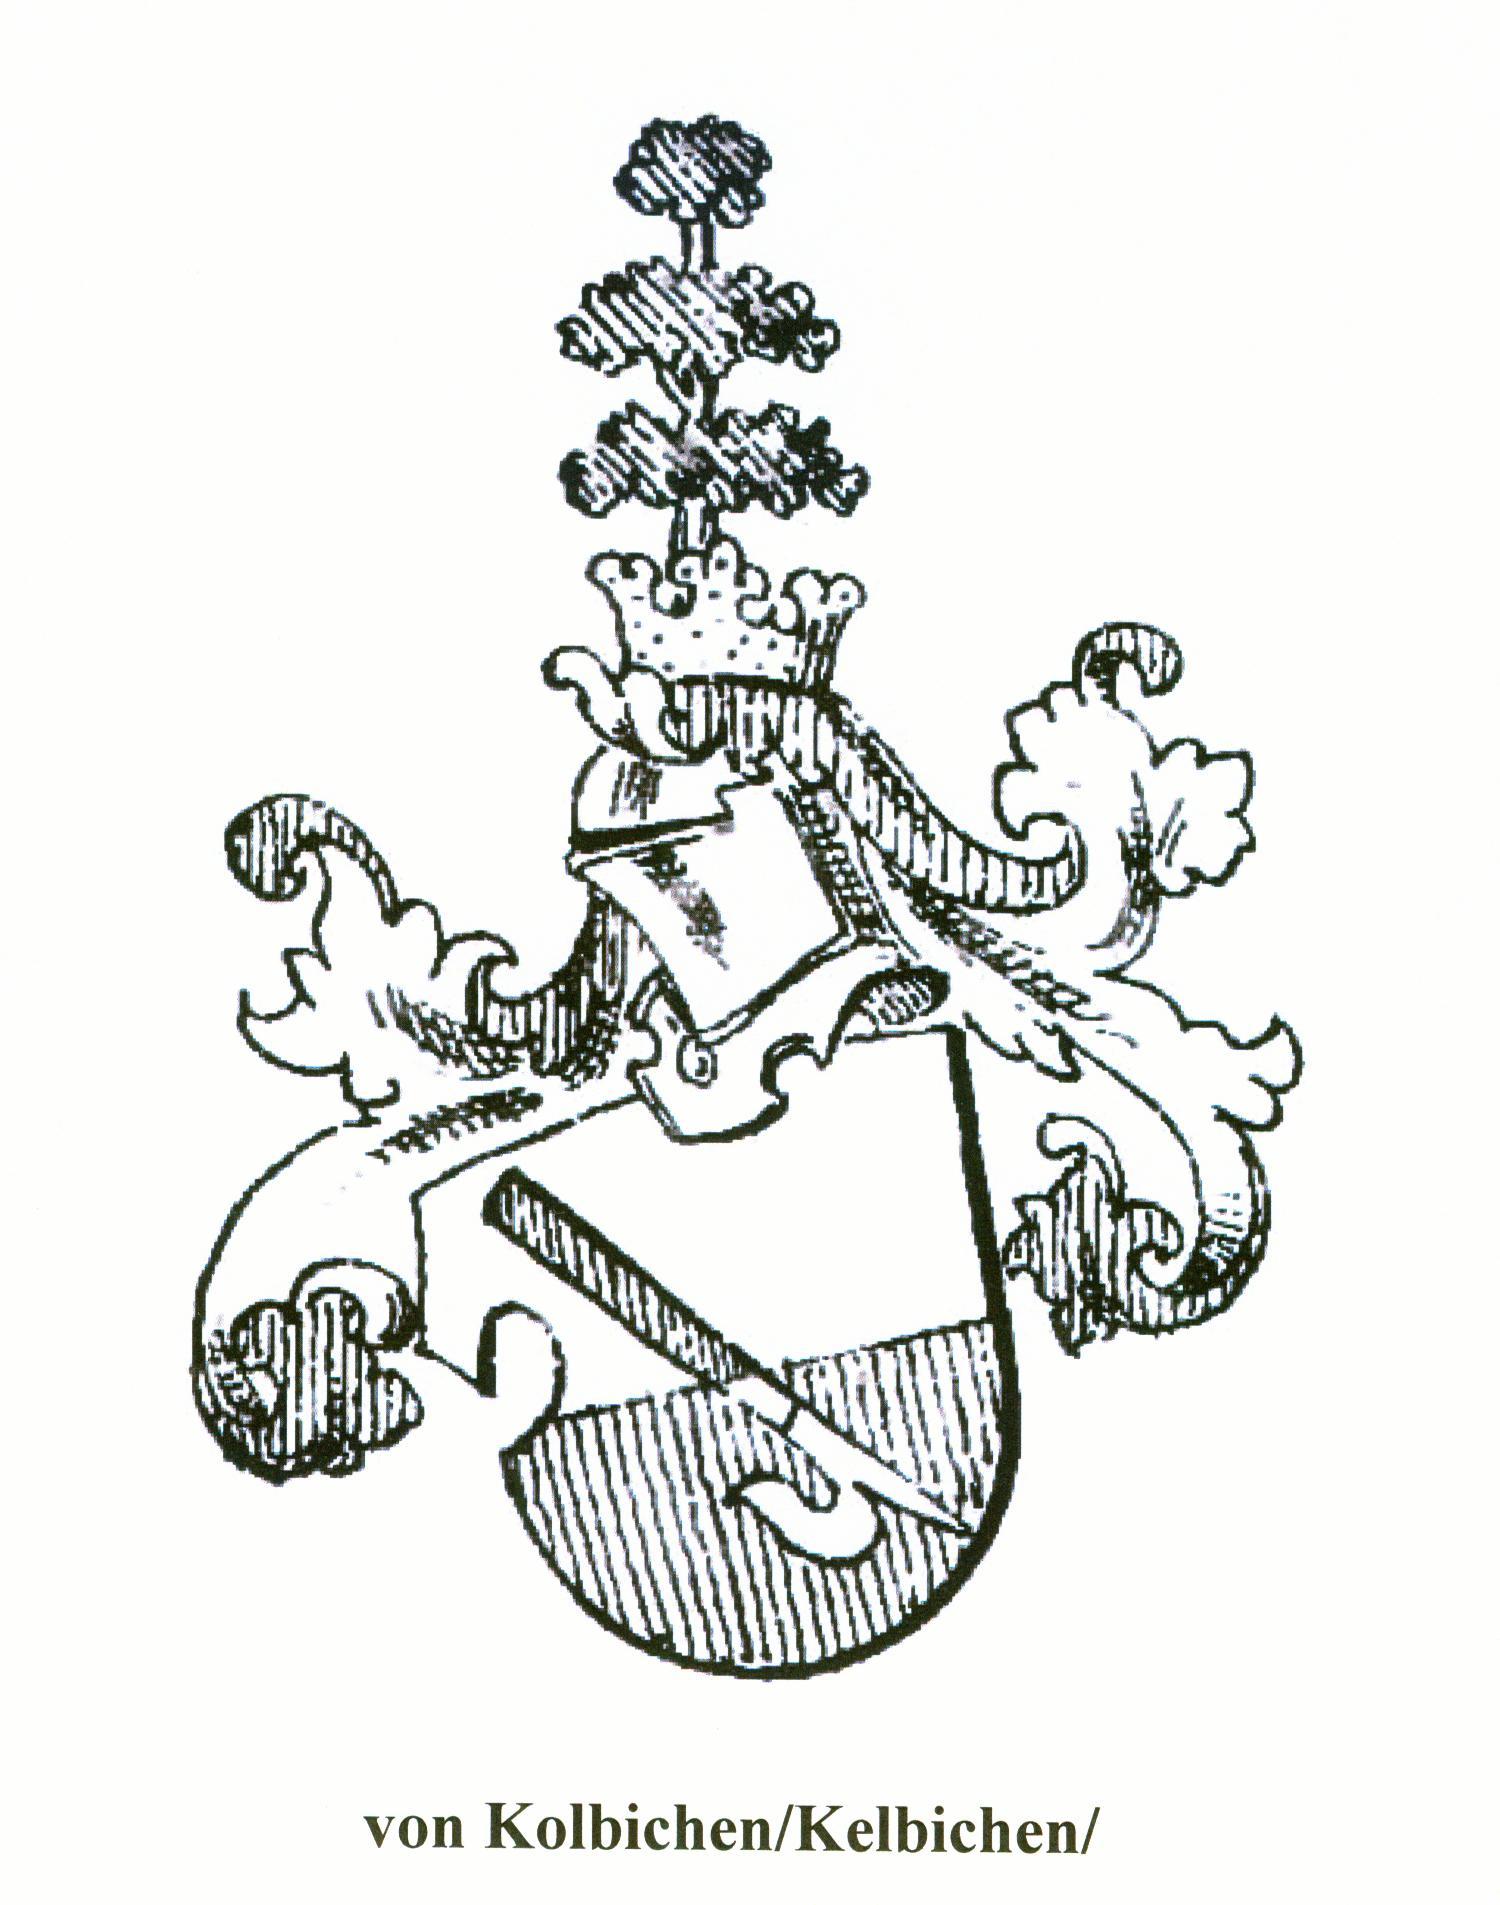 Kolbichen